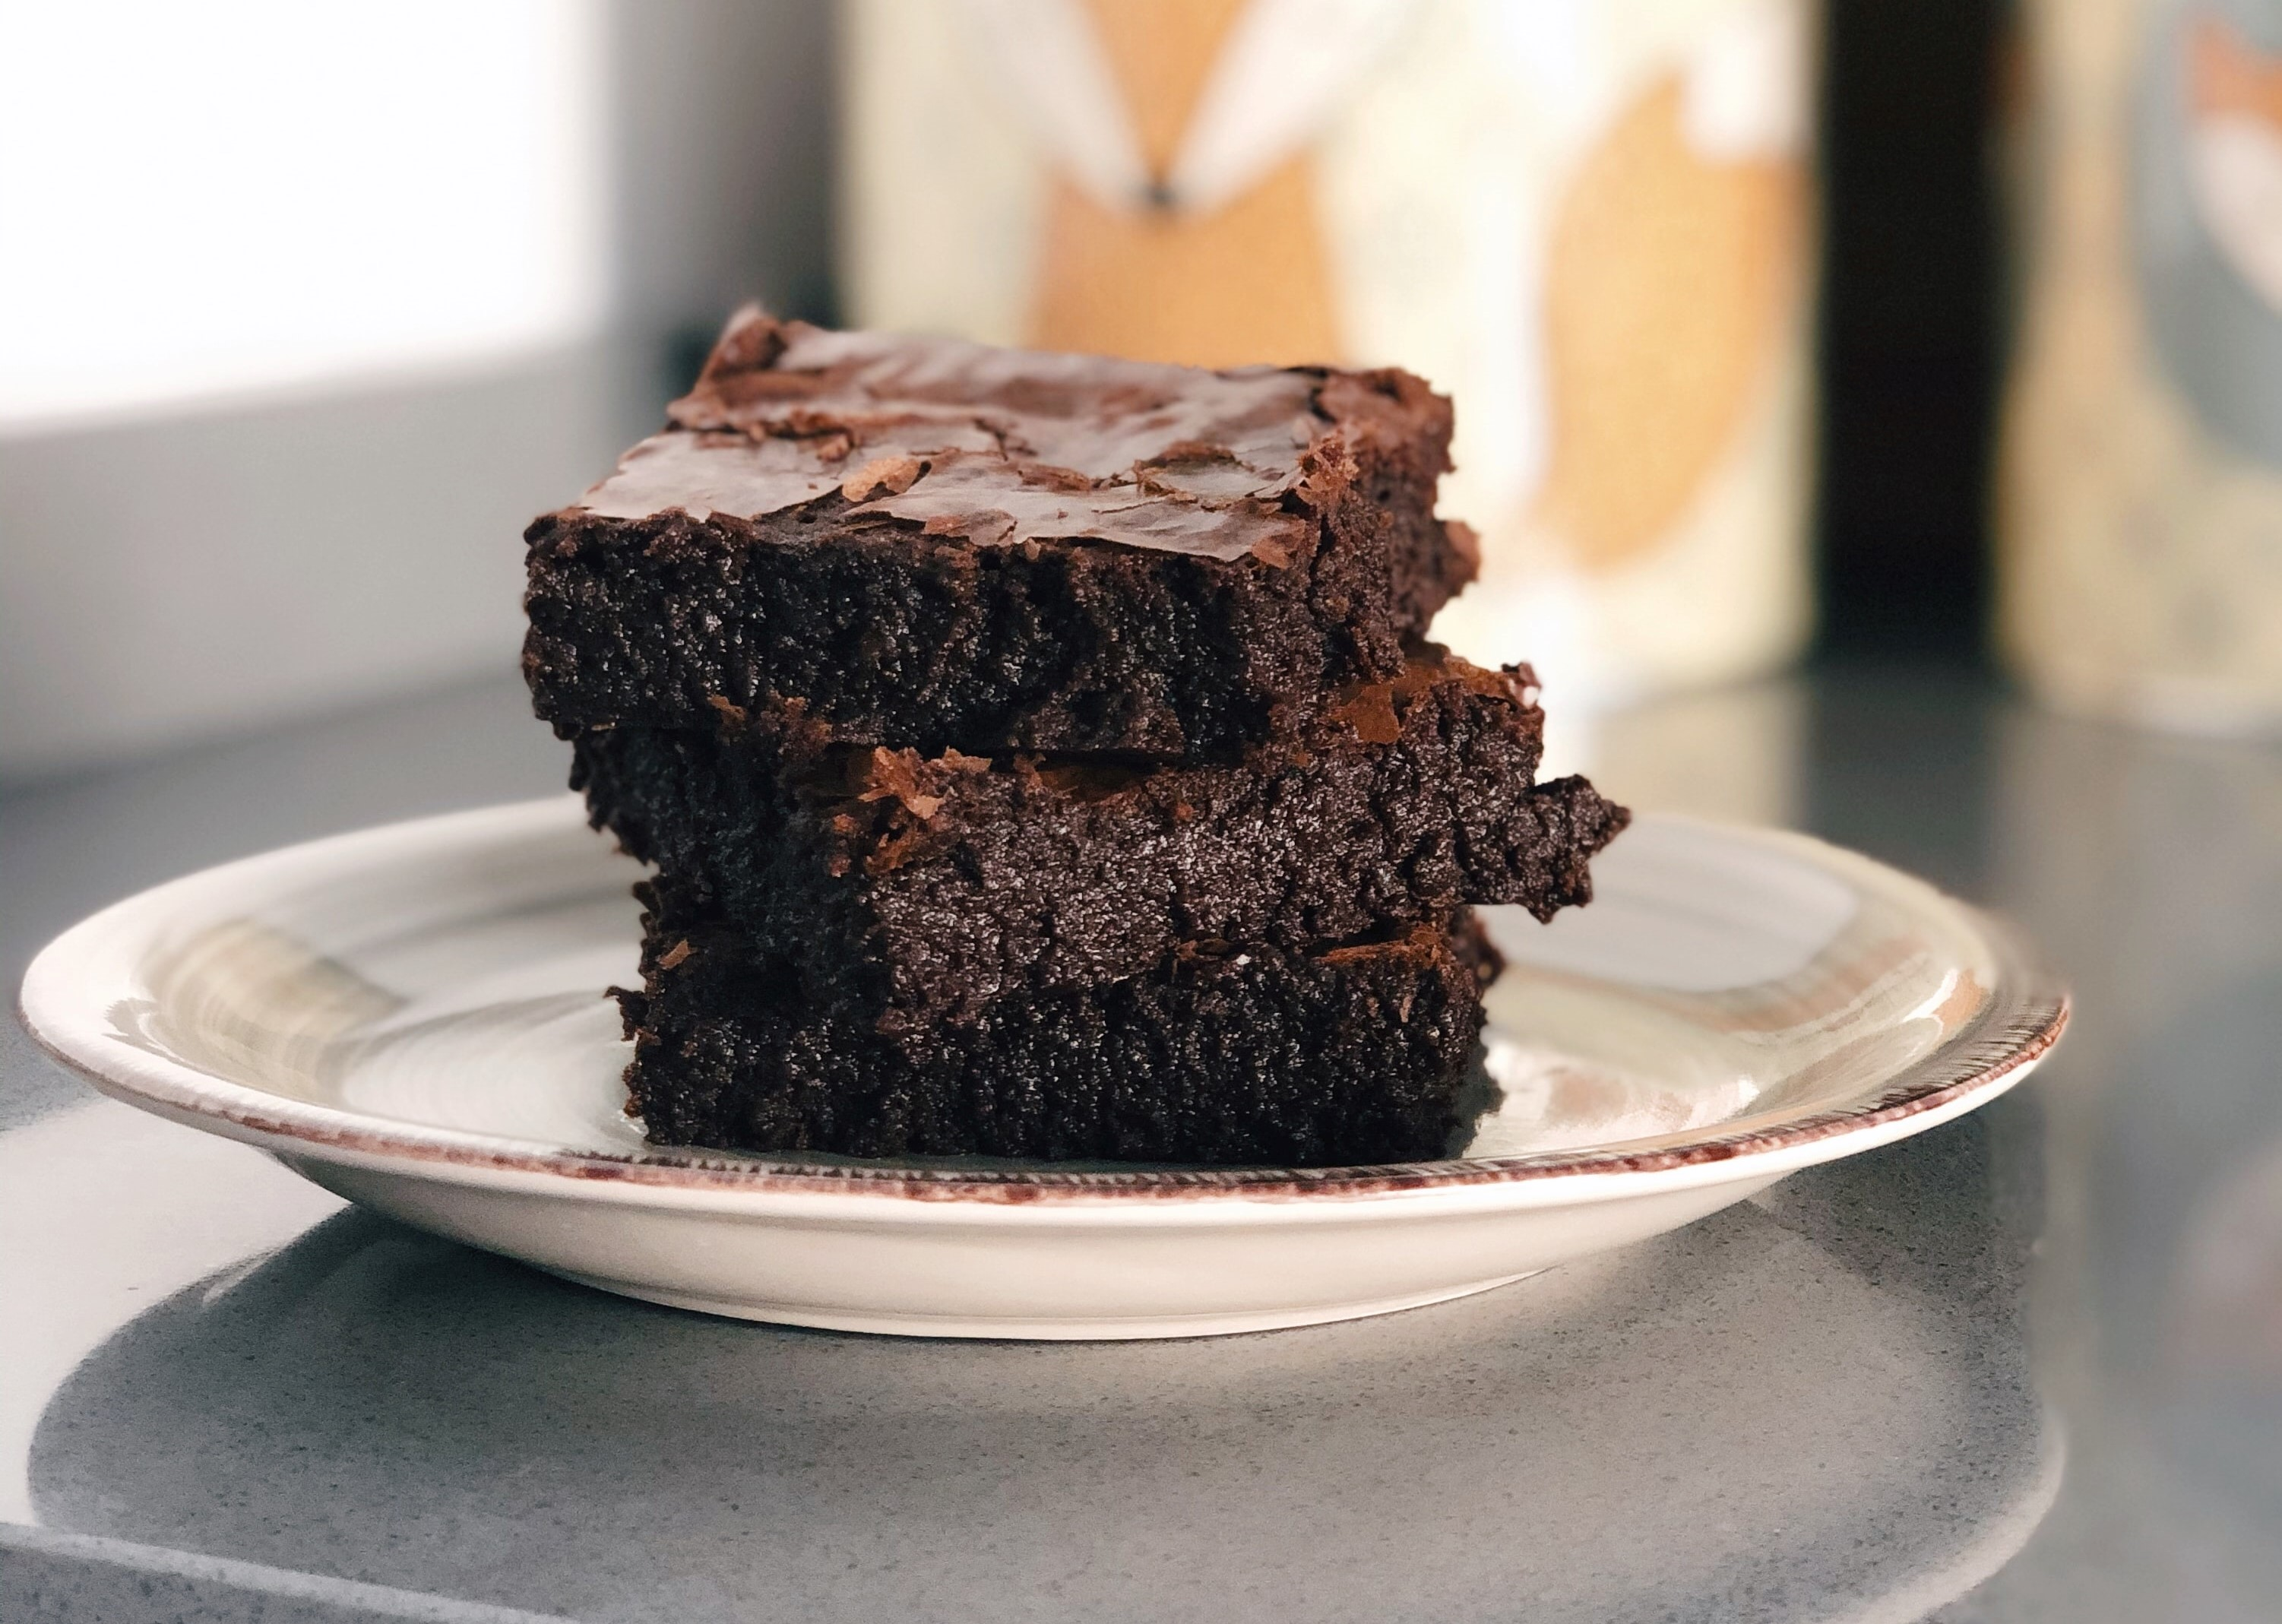 A plate of brownies. Photo by Arantxa Aniorte via Unsplash.